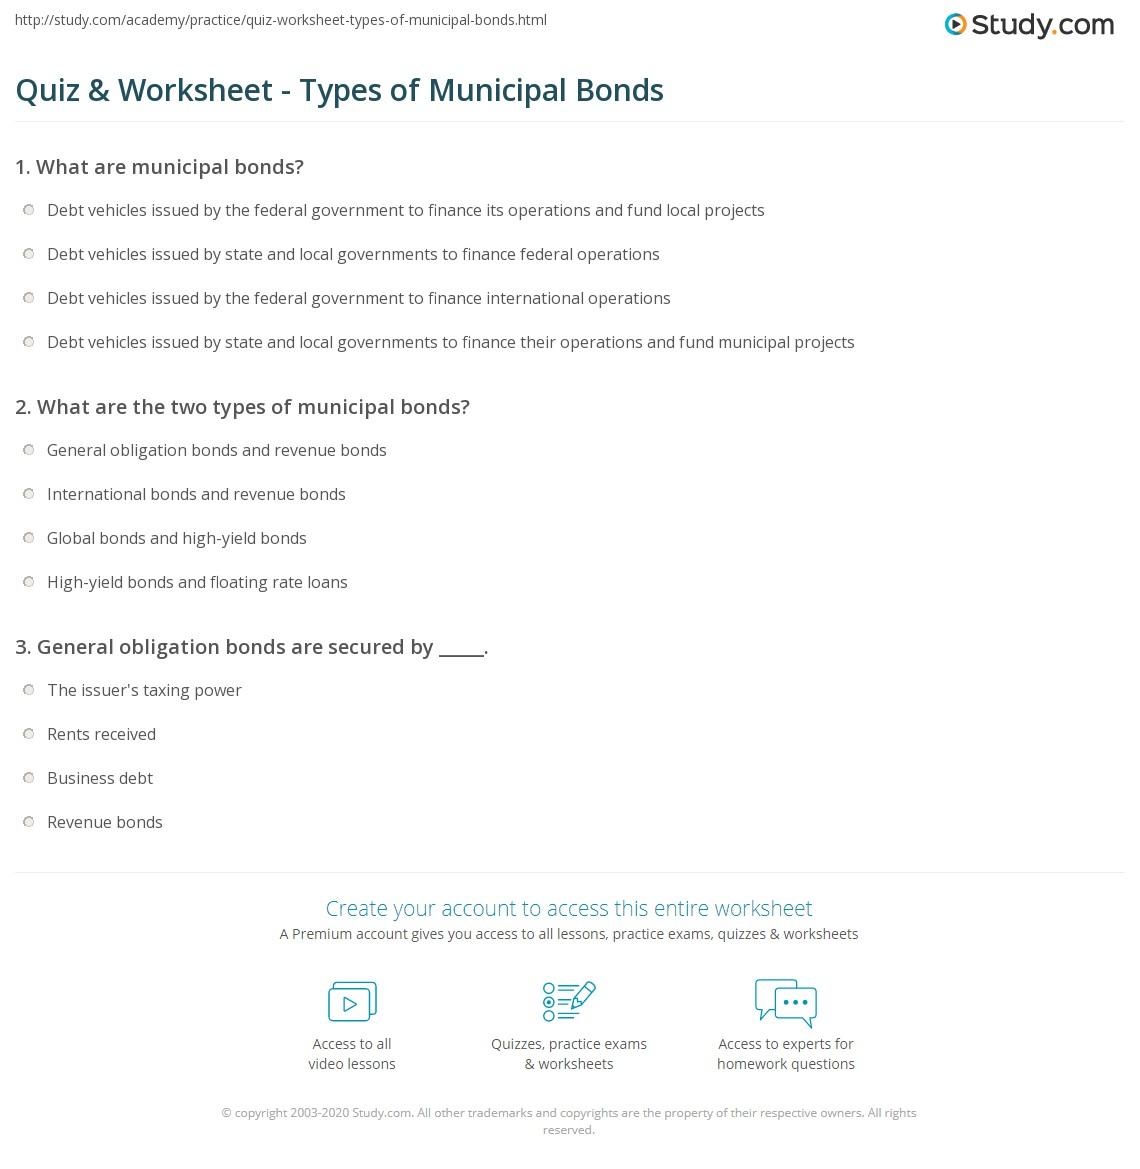 quiz & worksheet - types of municipal bonds | study